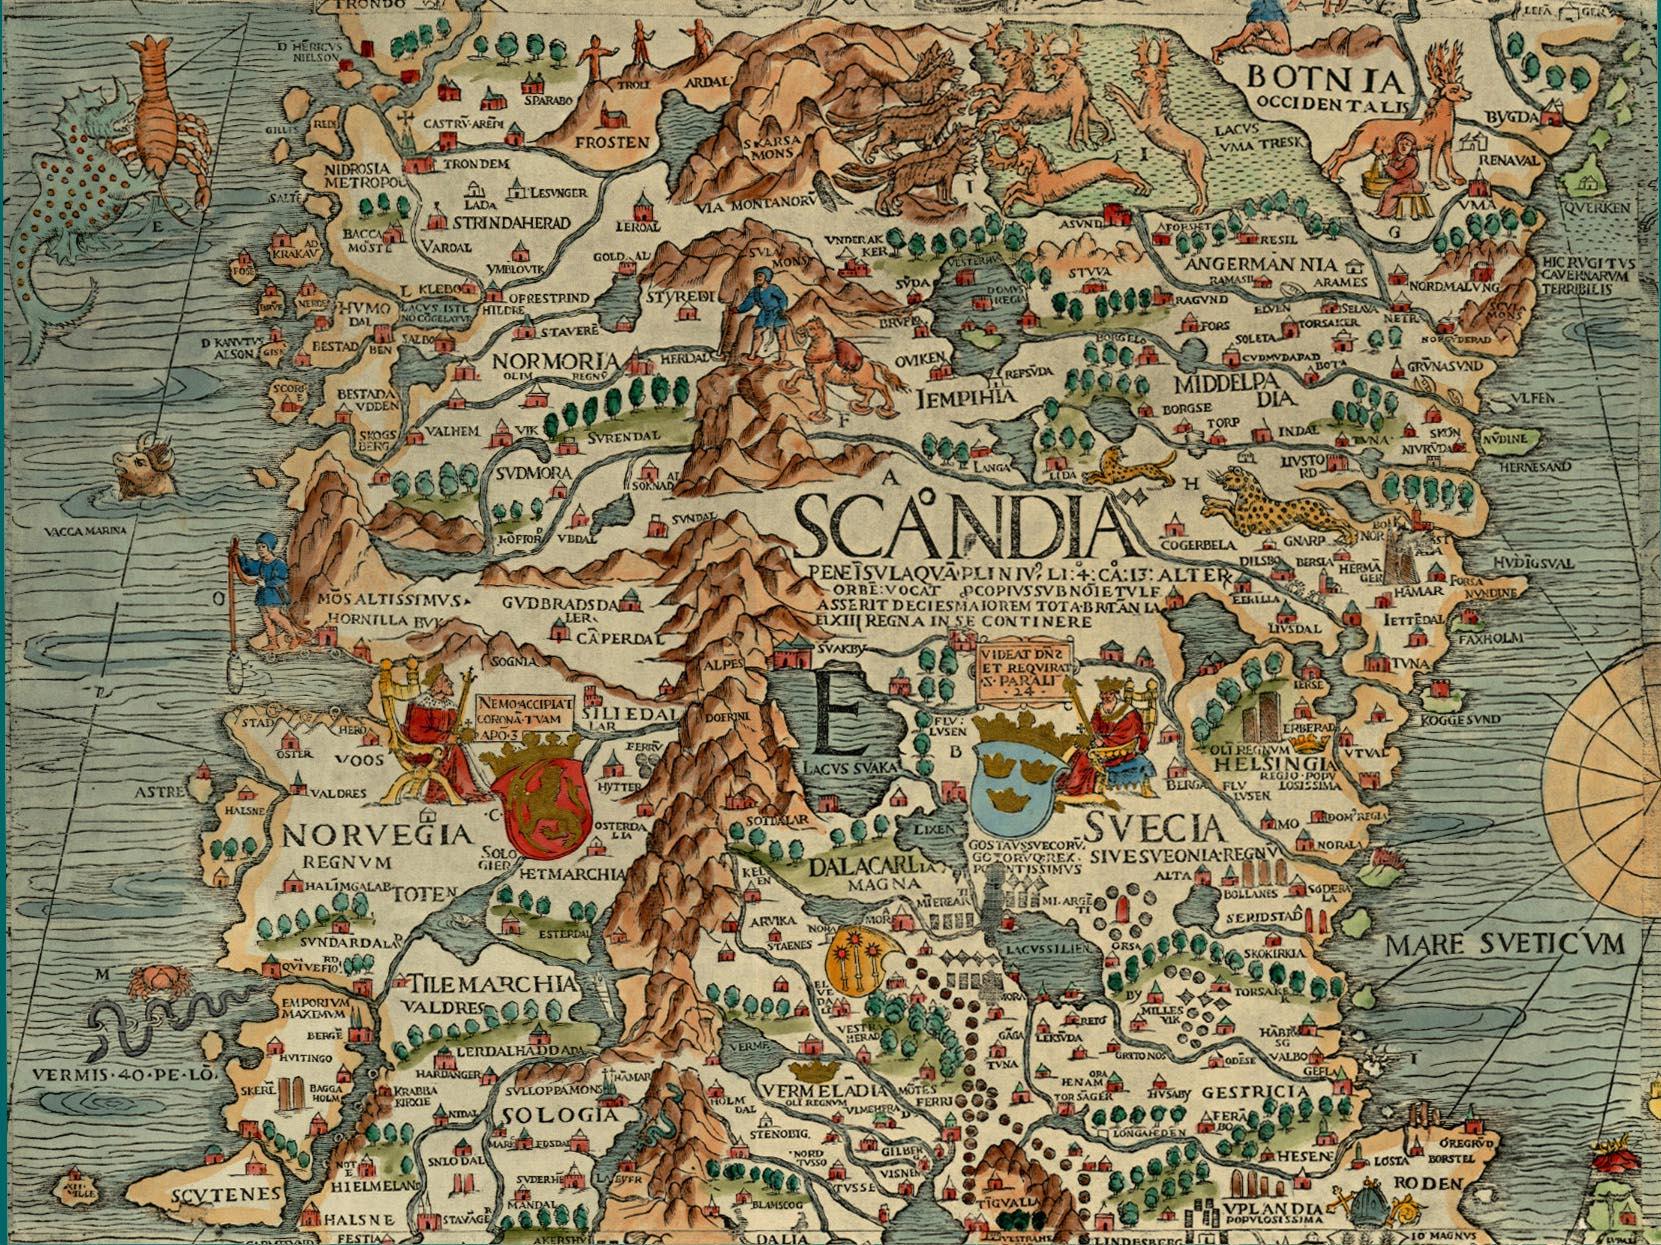 the viking imagination medieval cartography of scandinavia